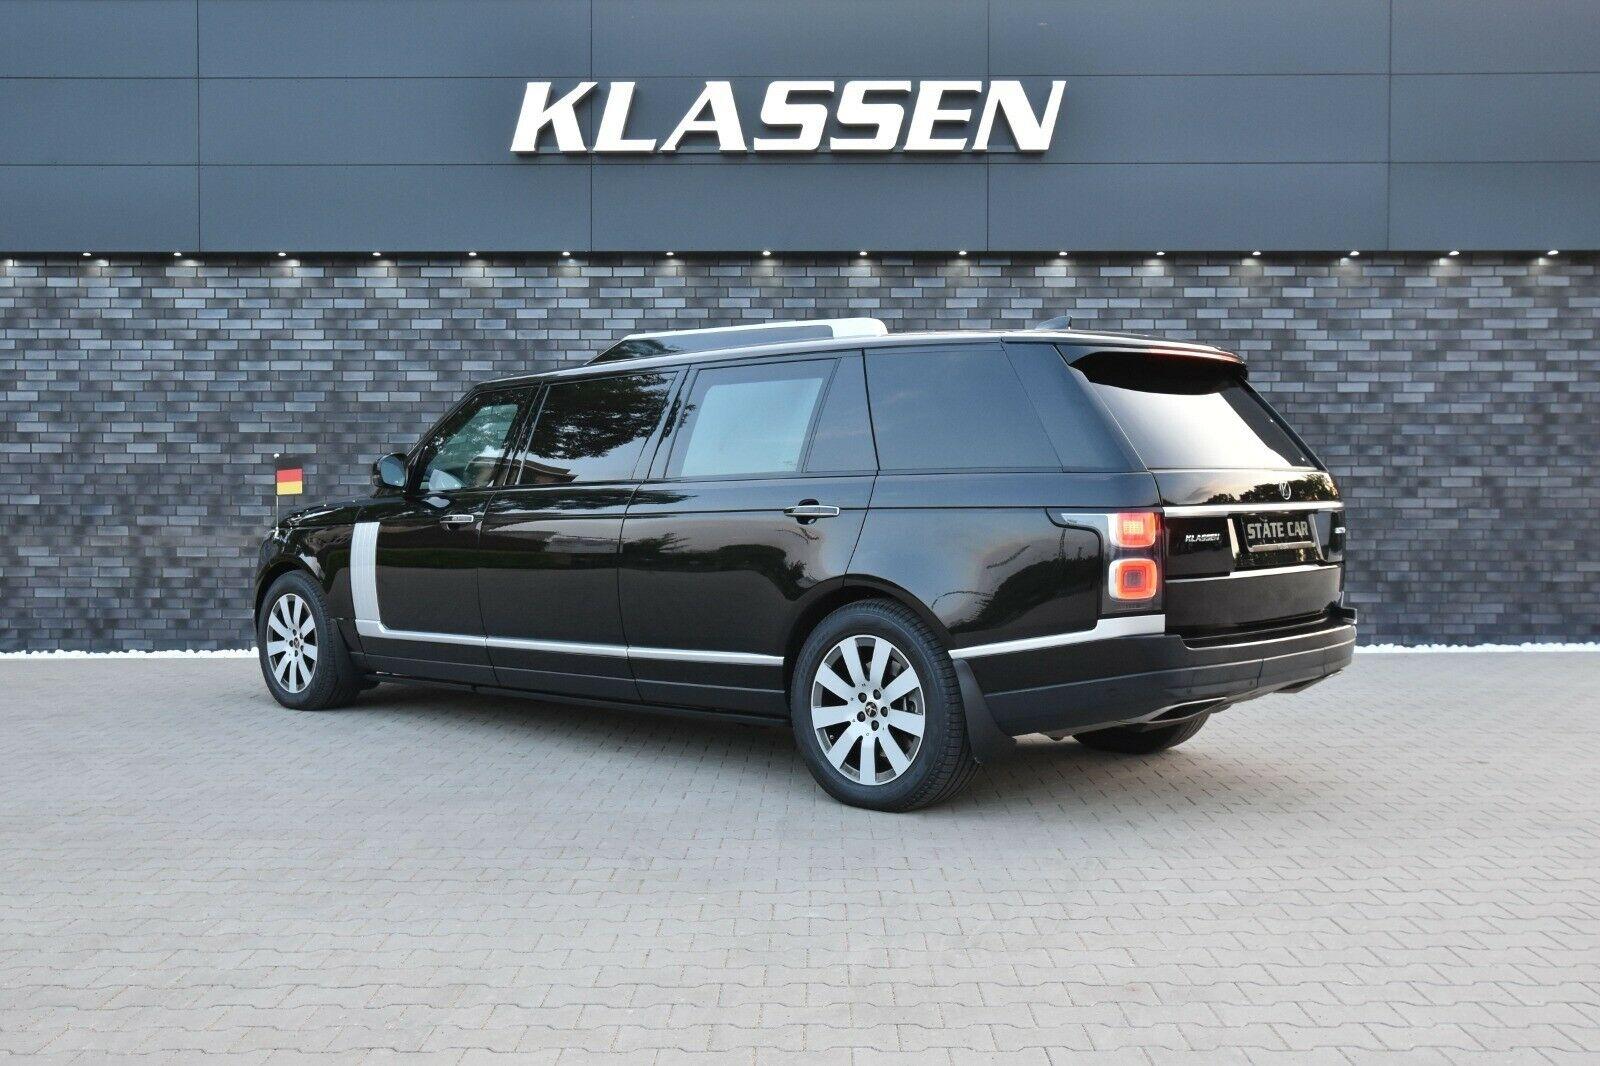 Range-Rover-SVAutobiography-by-Klassen-7